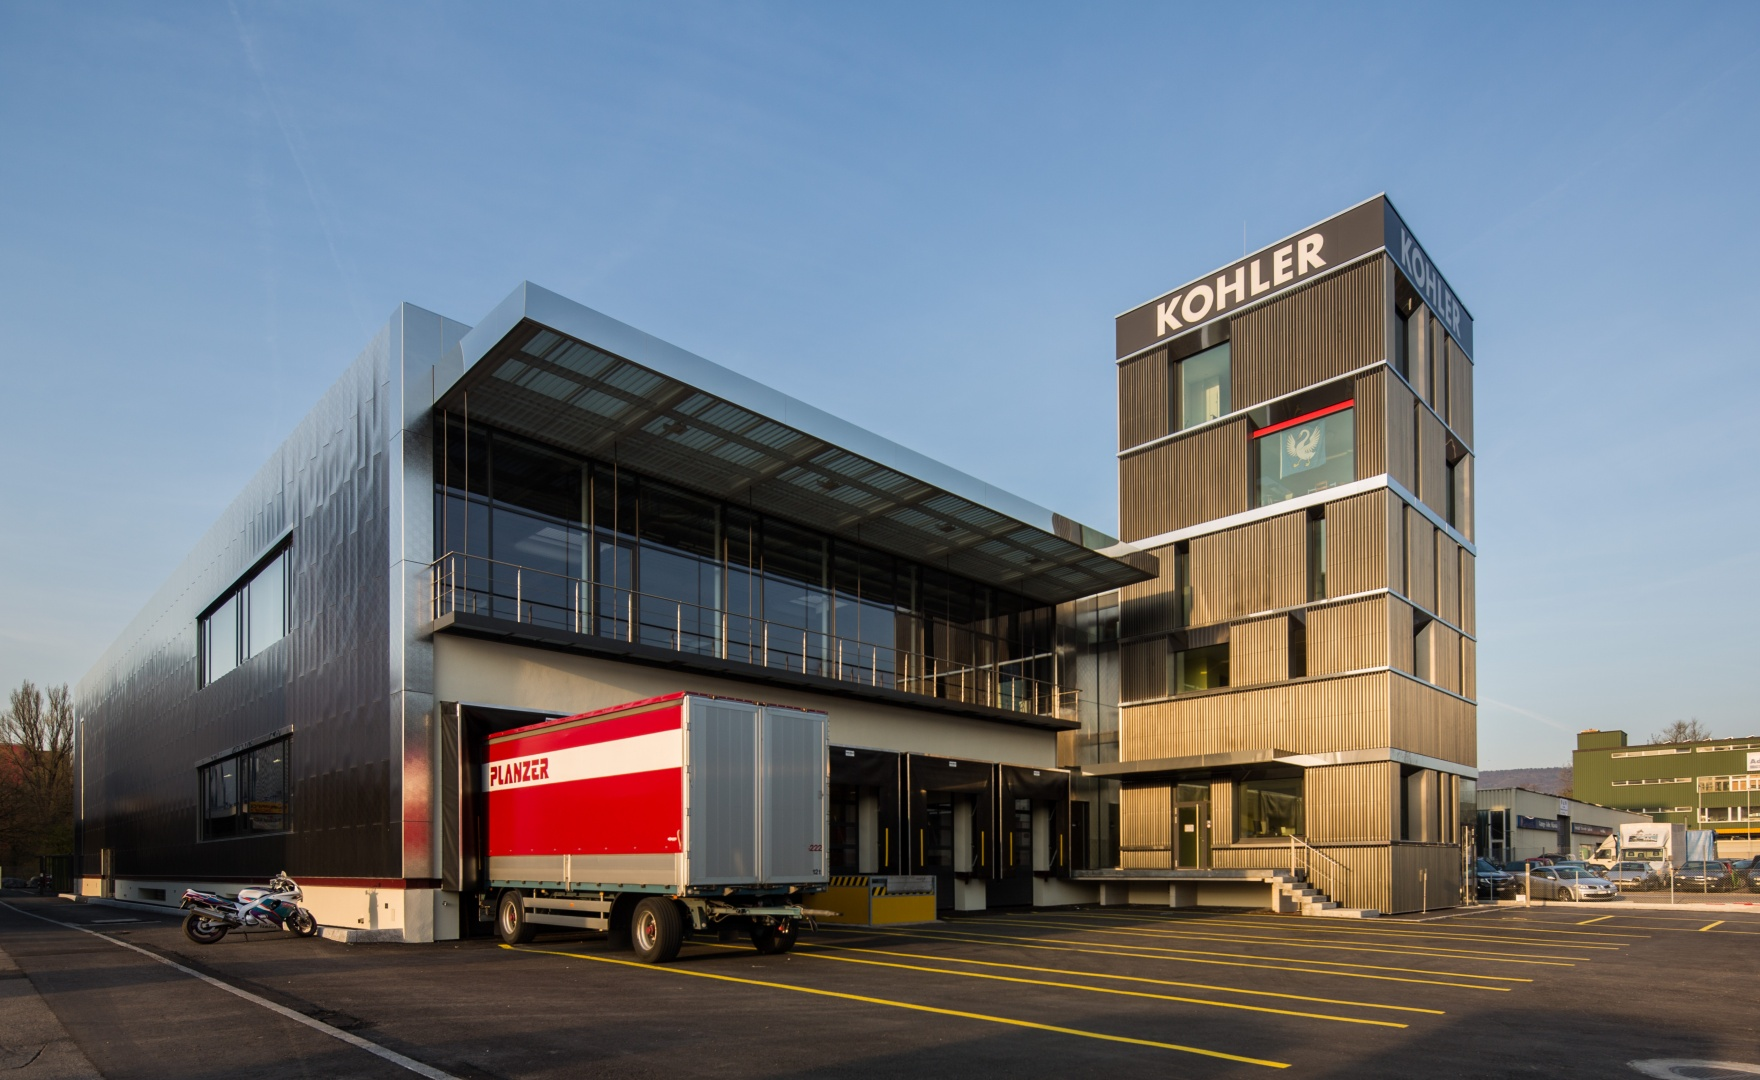 Büroturm und Anlieferung © Giorgia Müller